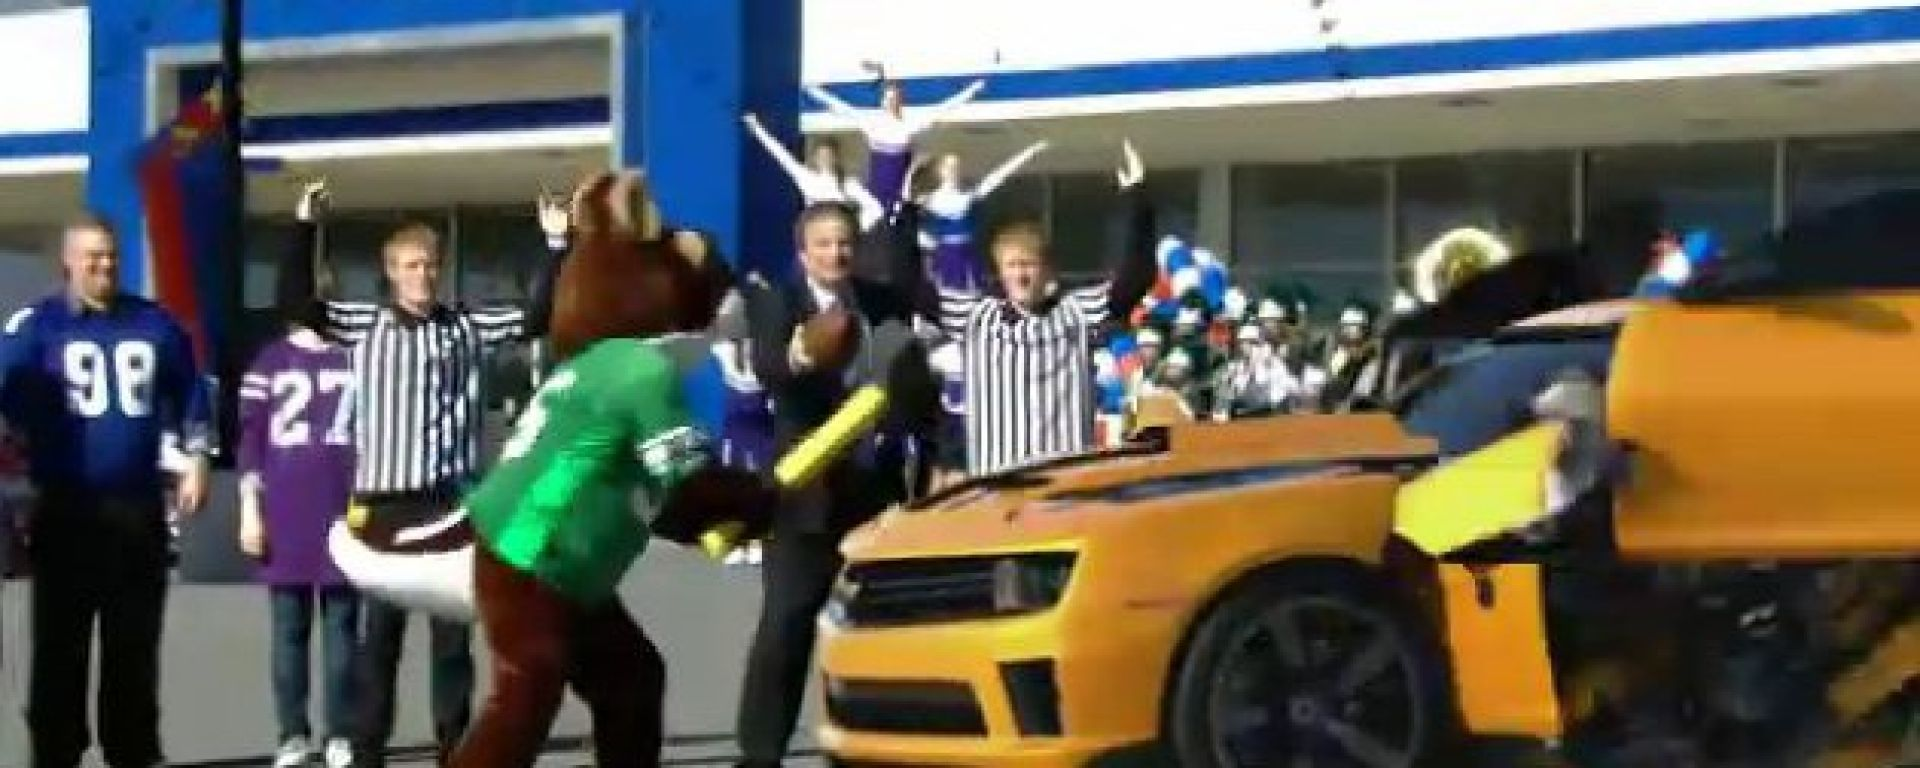 Chevrolet Camaro Transformers Super Bowl 2011